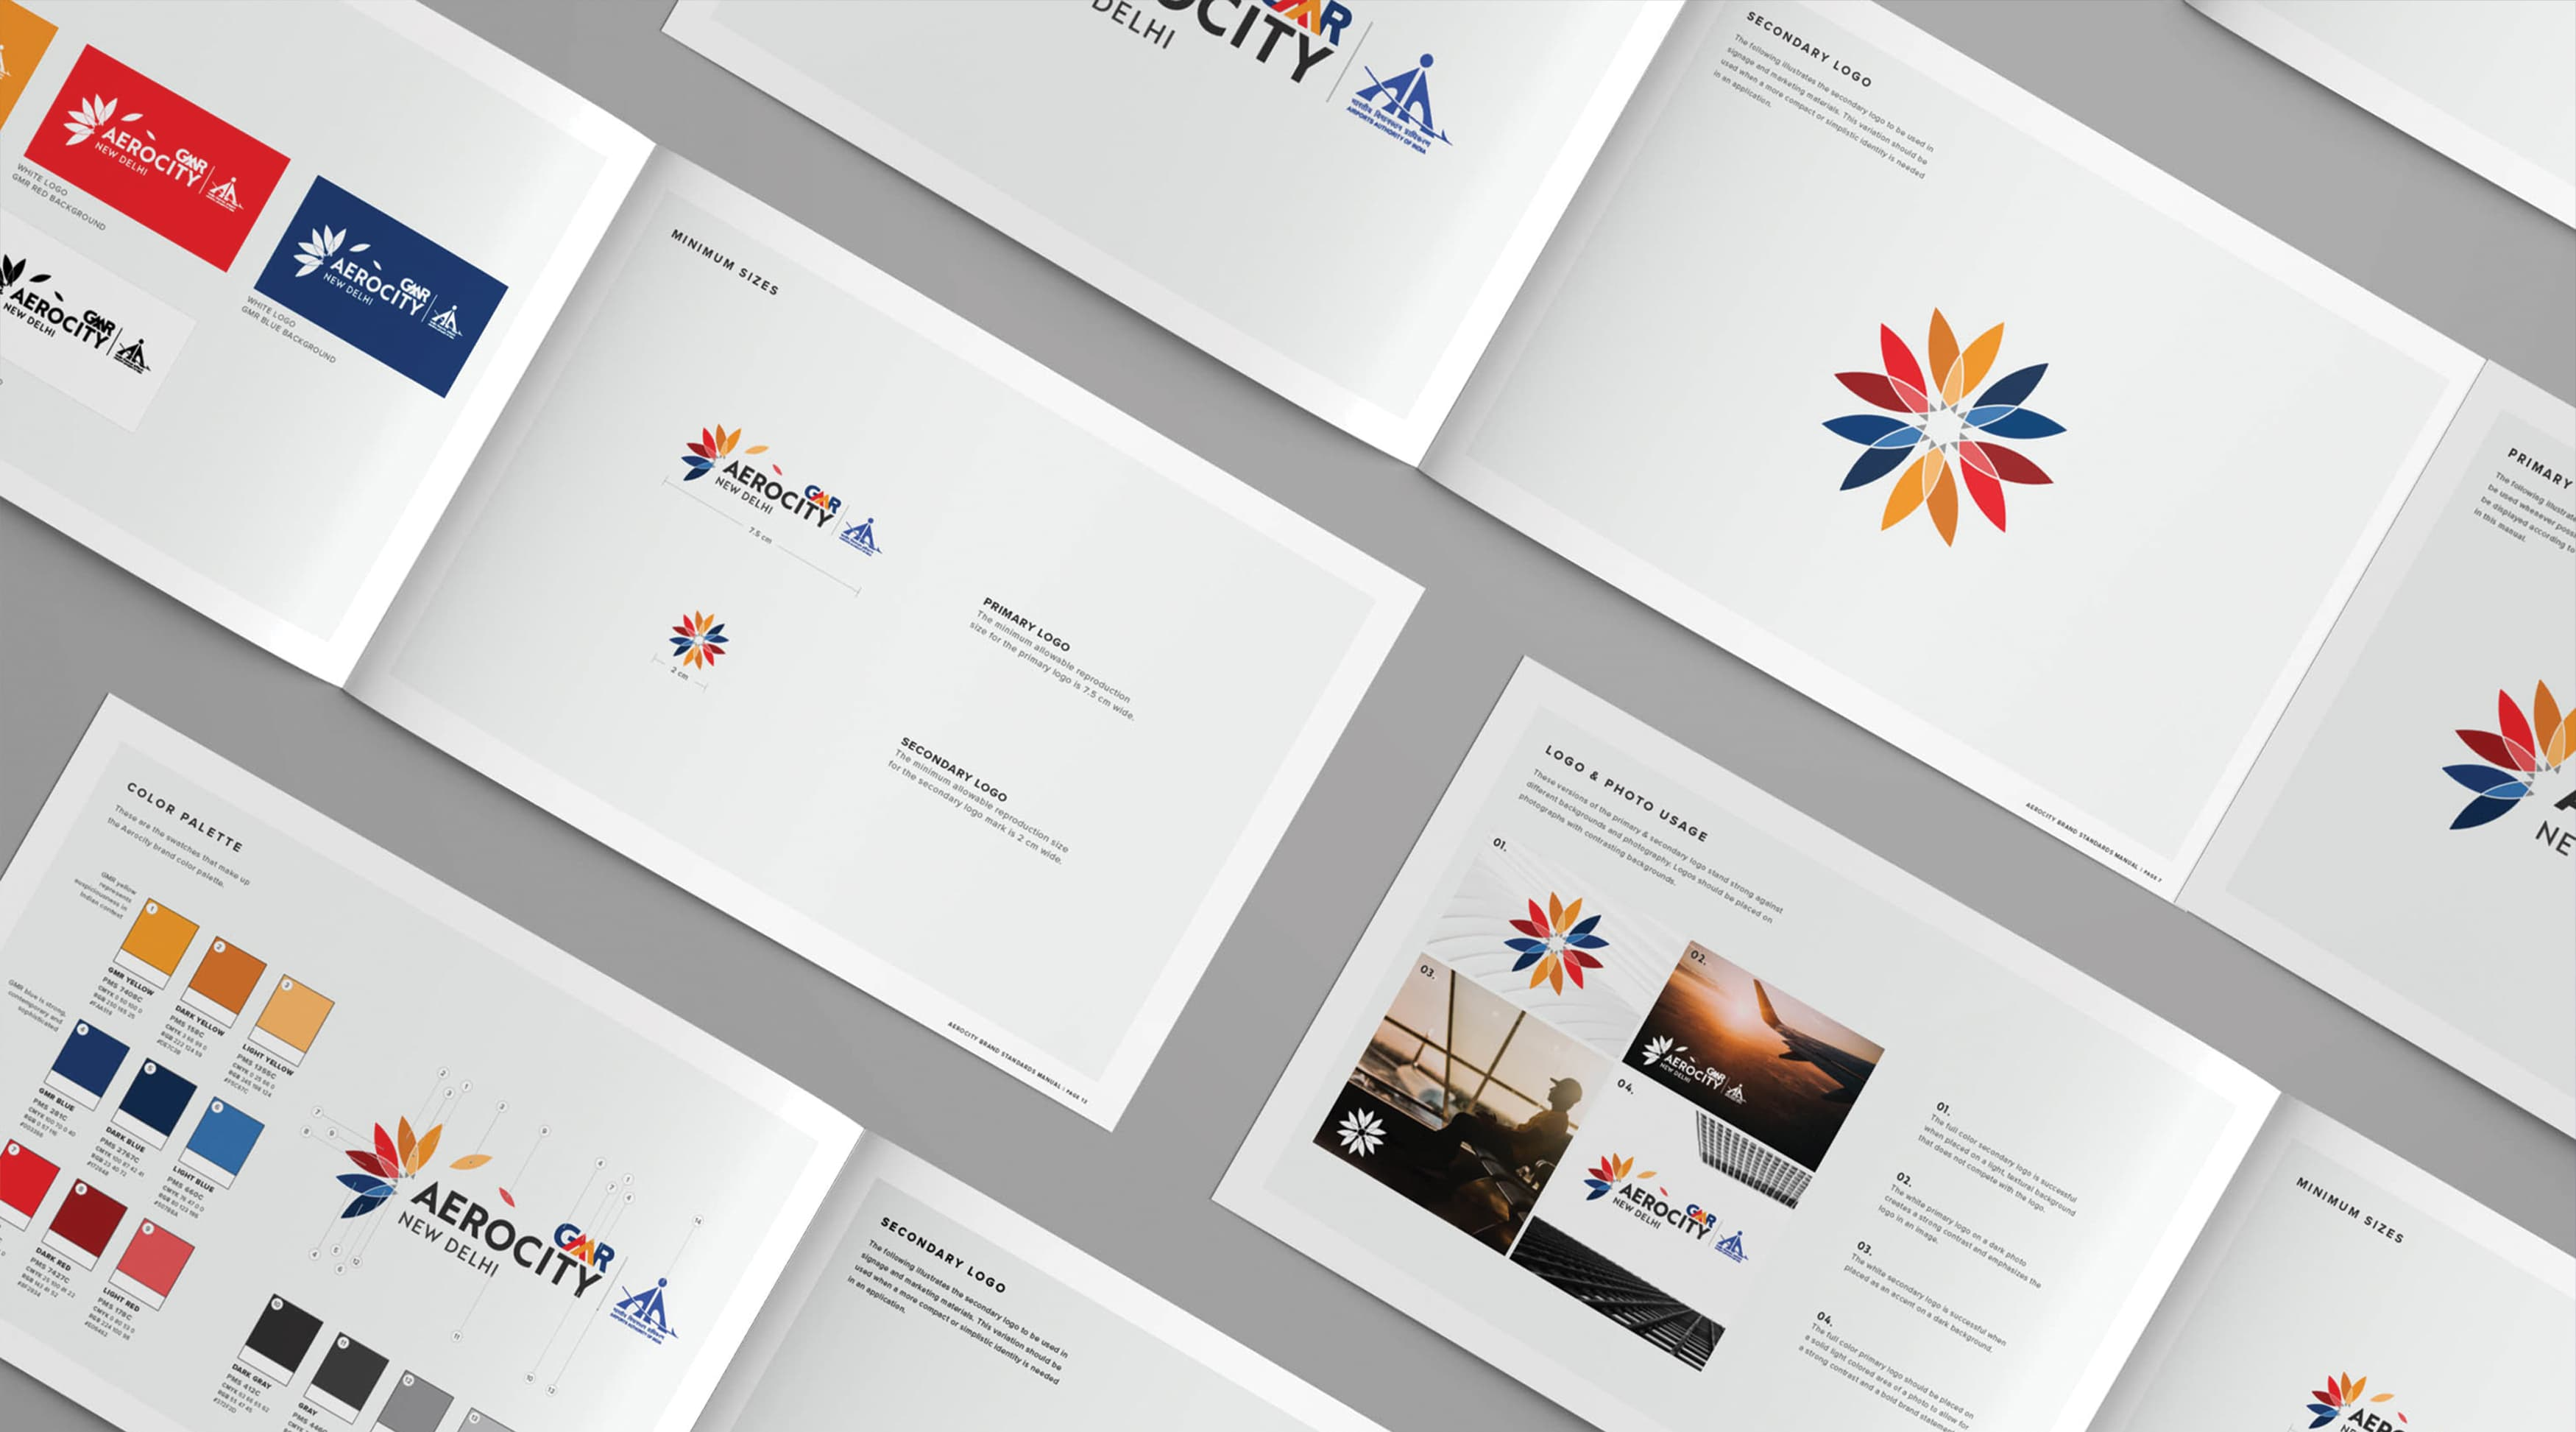 Aerocity, New Delhi, India, branding guidelines